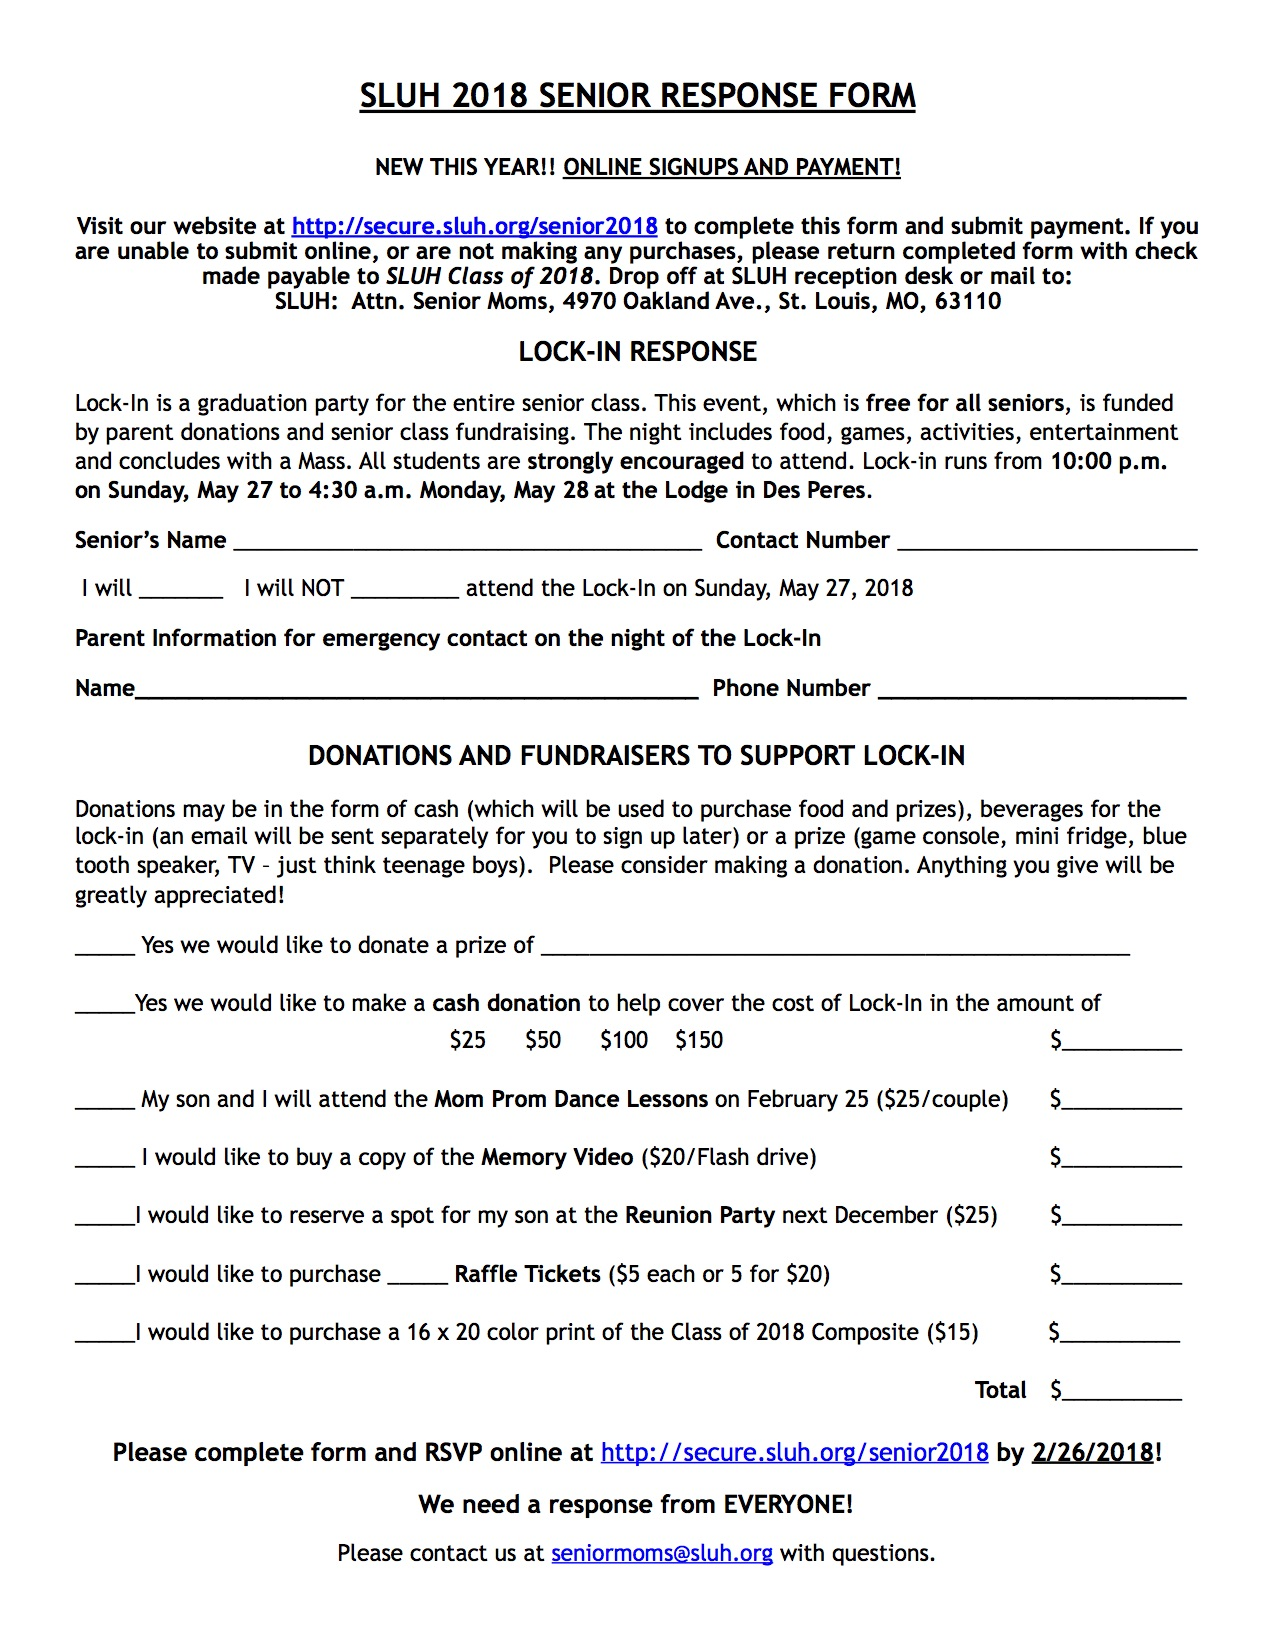 Engrossing Senior Response Form Senior Information St Louis University School Graduation Party Games Pdf Graduation Party Games Preschool art Graduation Party Games